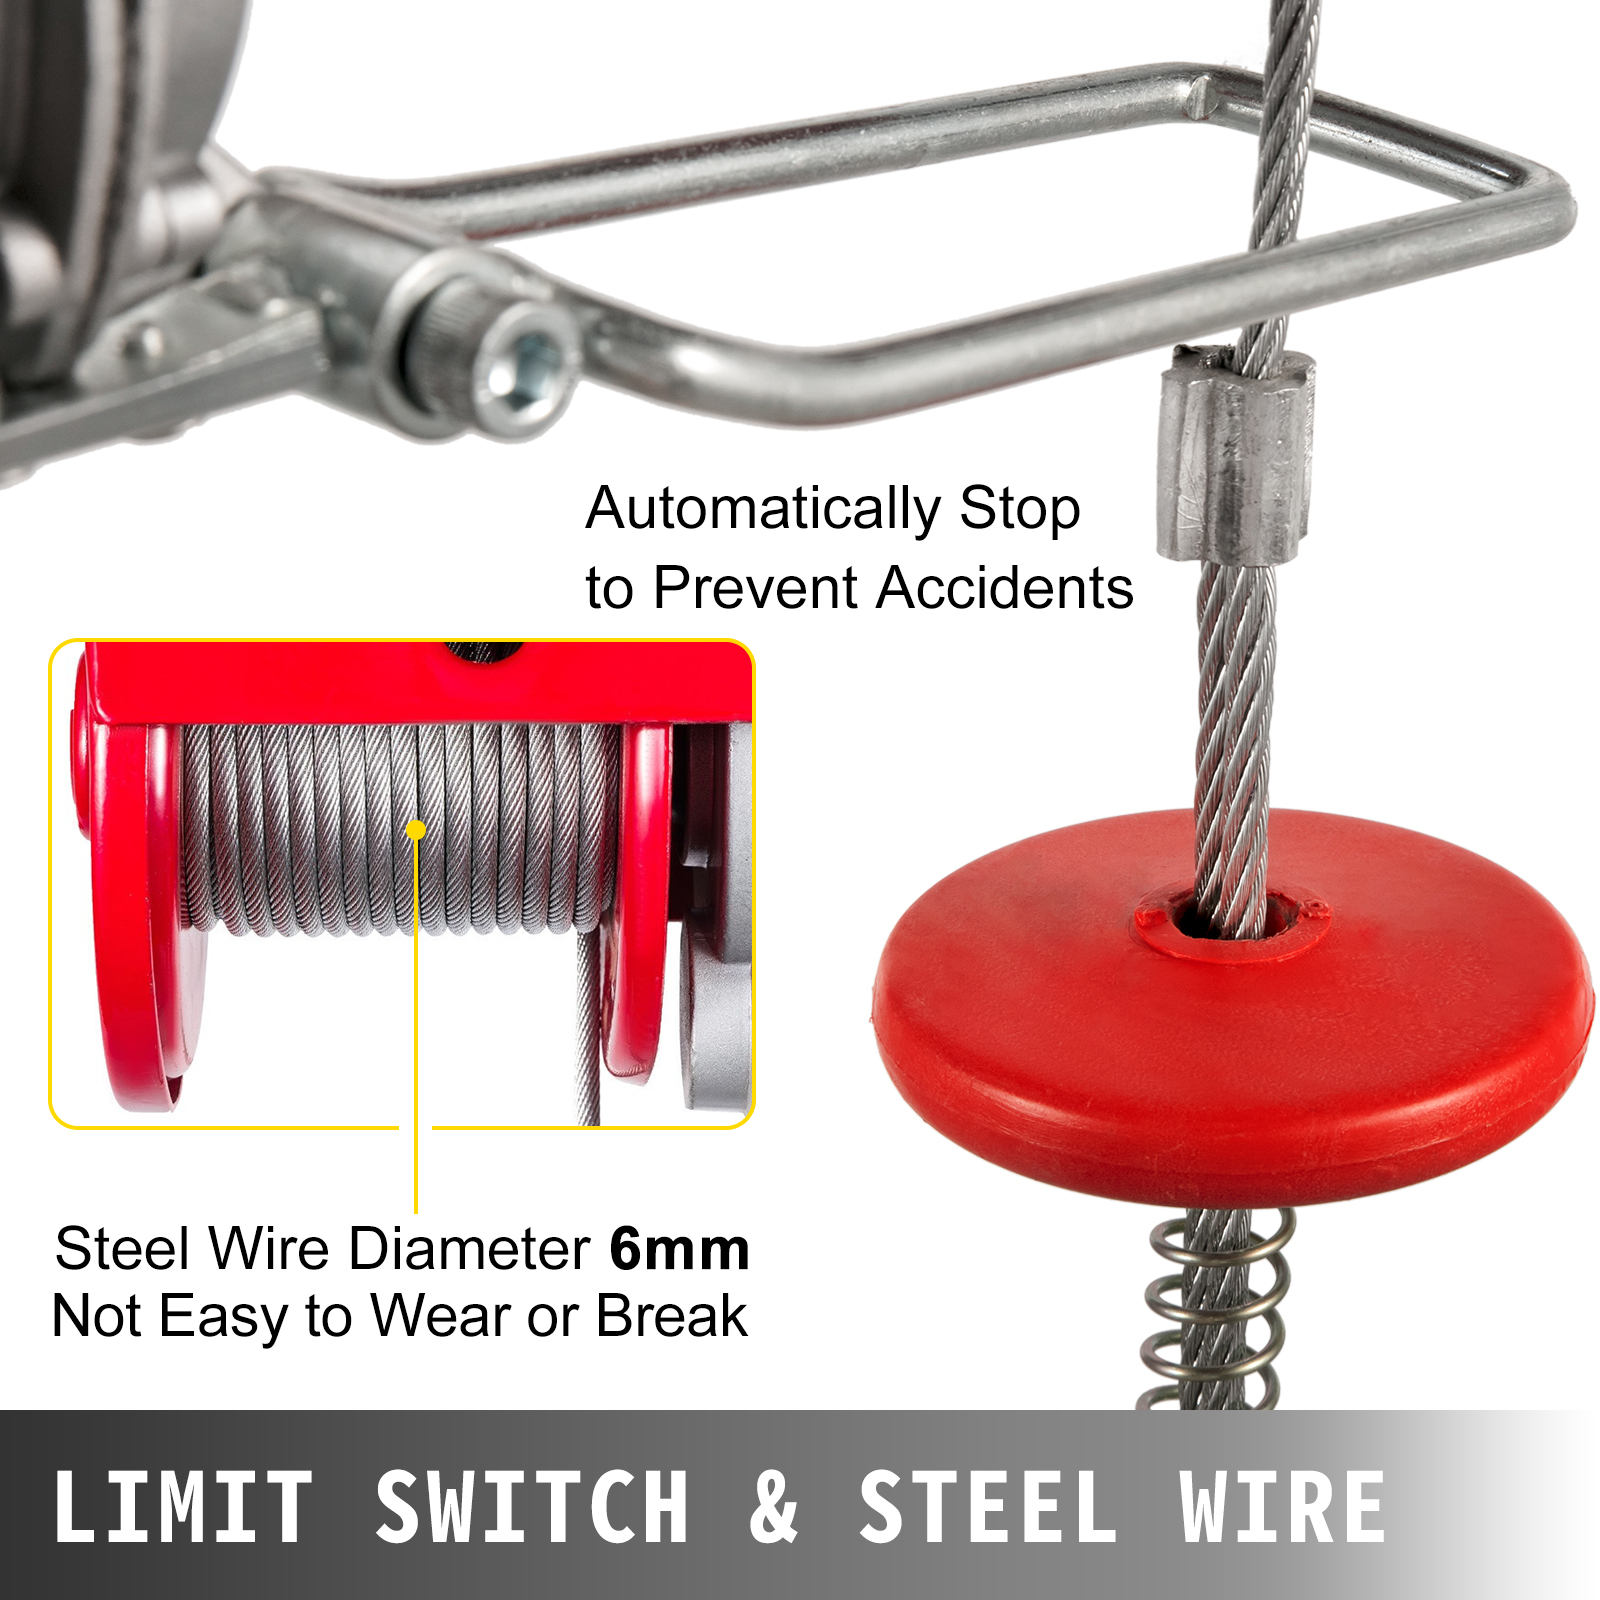 100kg-900kg-Electric-Hoist-Winch-Lifting-Engine-Crane-Cable-Lift-Hook-Garage miniature 77